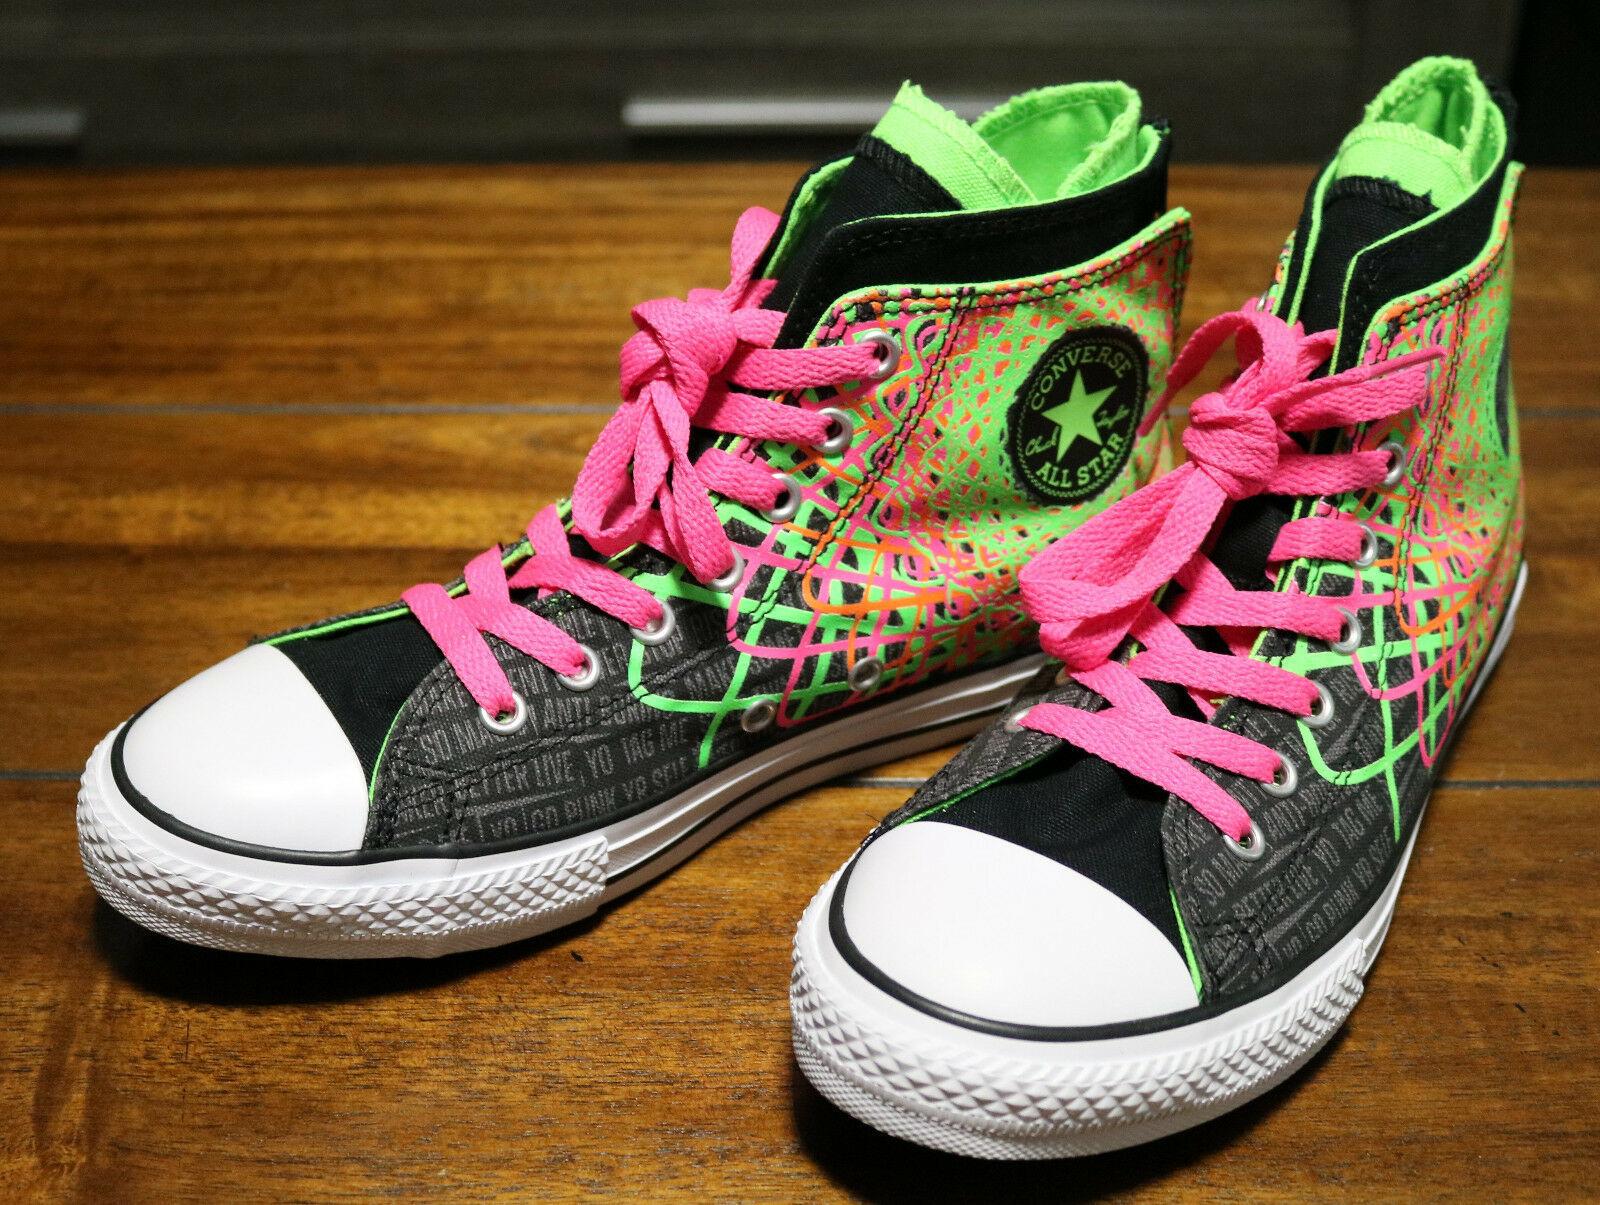 Converse Chuck Taylor All Star Zipback 649963C Black Pink Green Shoes Girls Sz 5 image 2